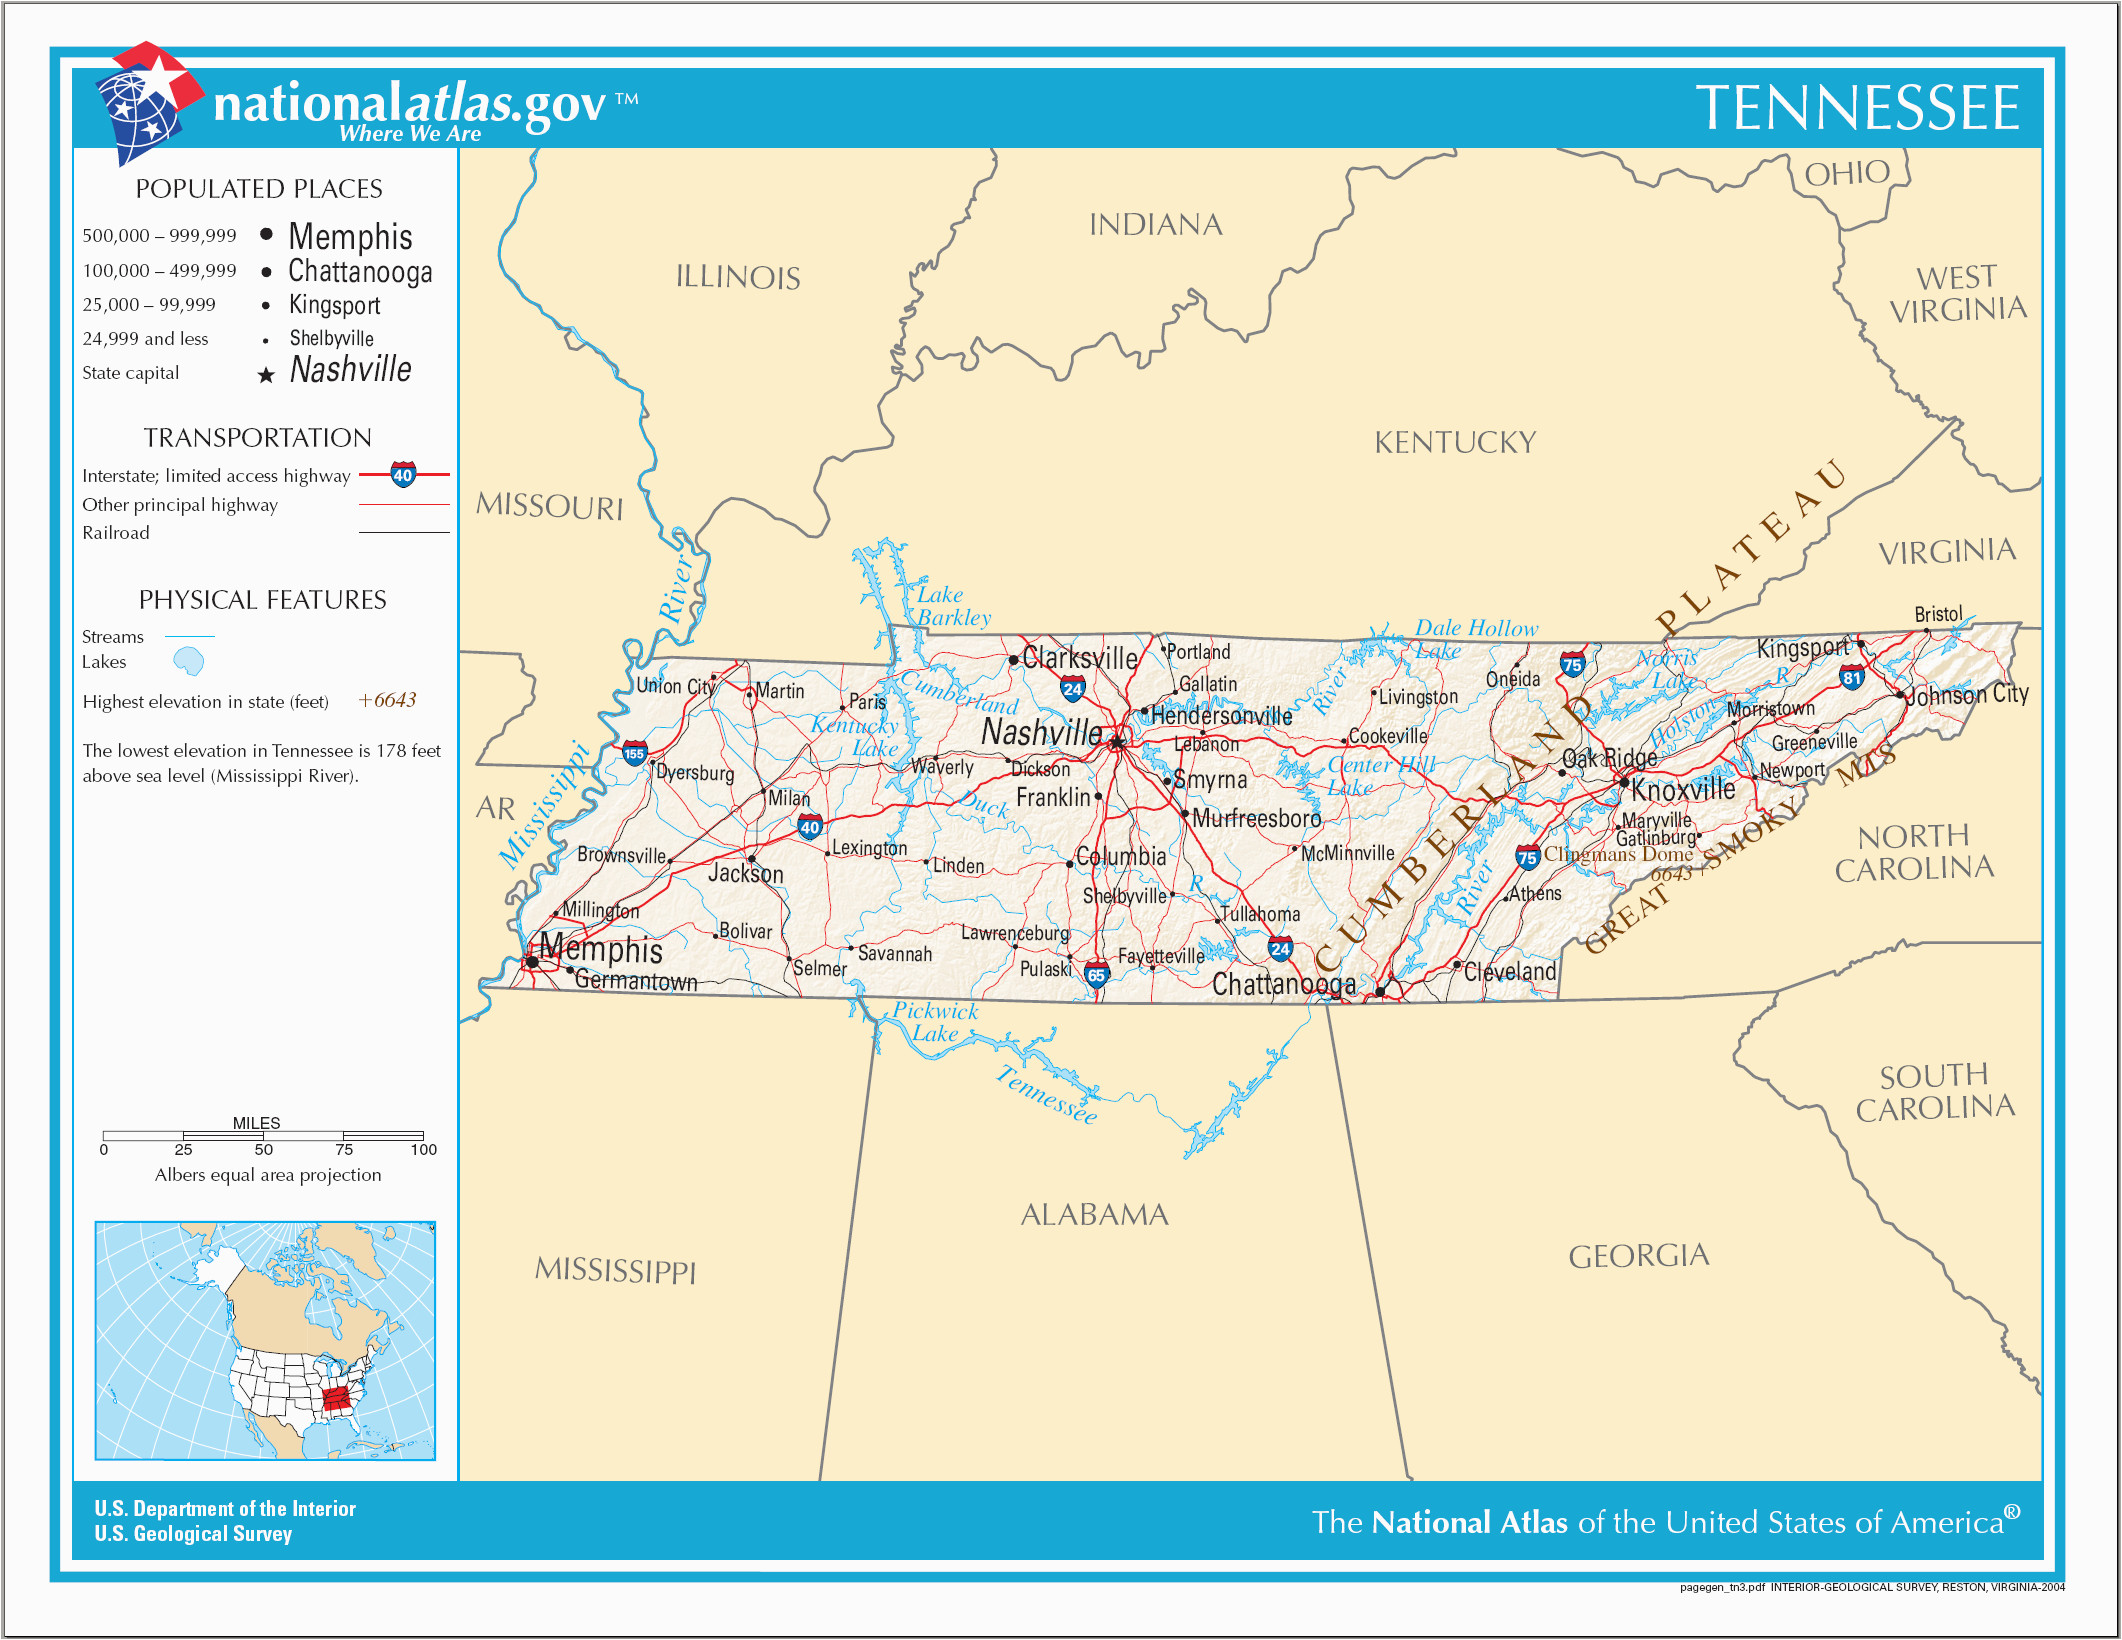 Kingsport Tennessee Map   secretmuseum on johnson city tennessee map, paducah tennessee map, blountville tennessee map, clairfield tennessee map, rocky top tennessee map, canton tennessee map, watauga lake tennessee map, marion tennessee map, holston lake tennessee map, williamsport tennessee map, gruetli laager tennessee map, la follette tennessee map, algood tennessee map, hardin valley tennessee map, spartanburg tennessee map, rogersville tennessee map, cherokee national forest tennessee map, helenwood tennessee map, dekalb county tennessee map, wears valley tennessee map,